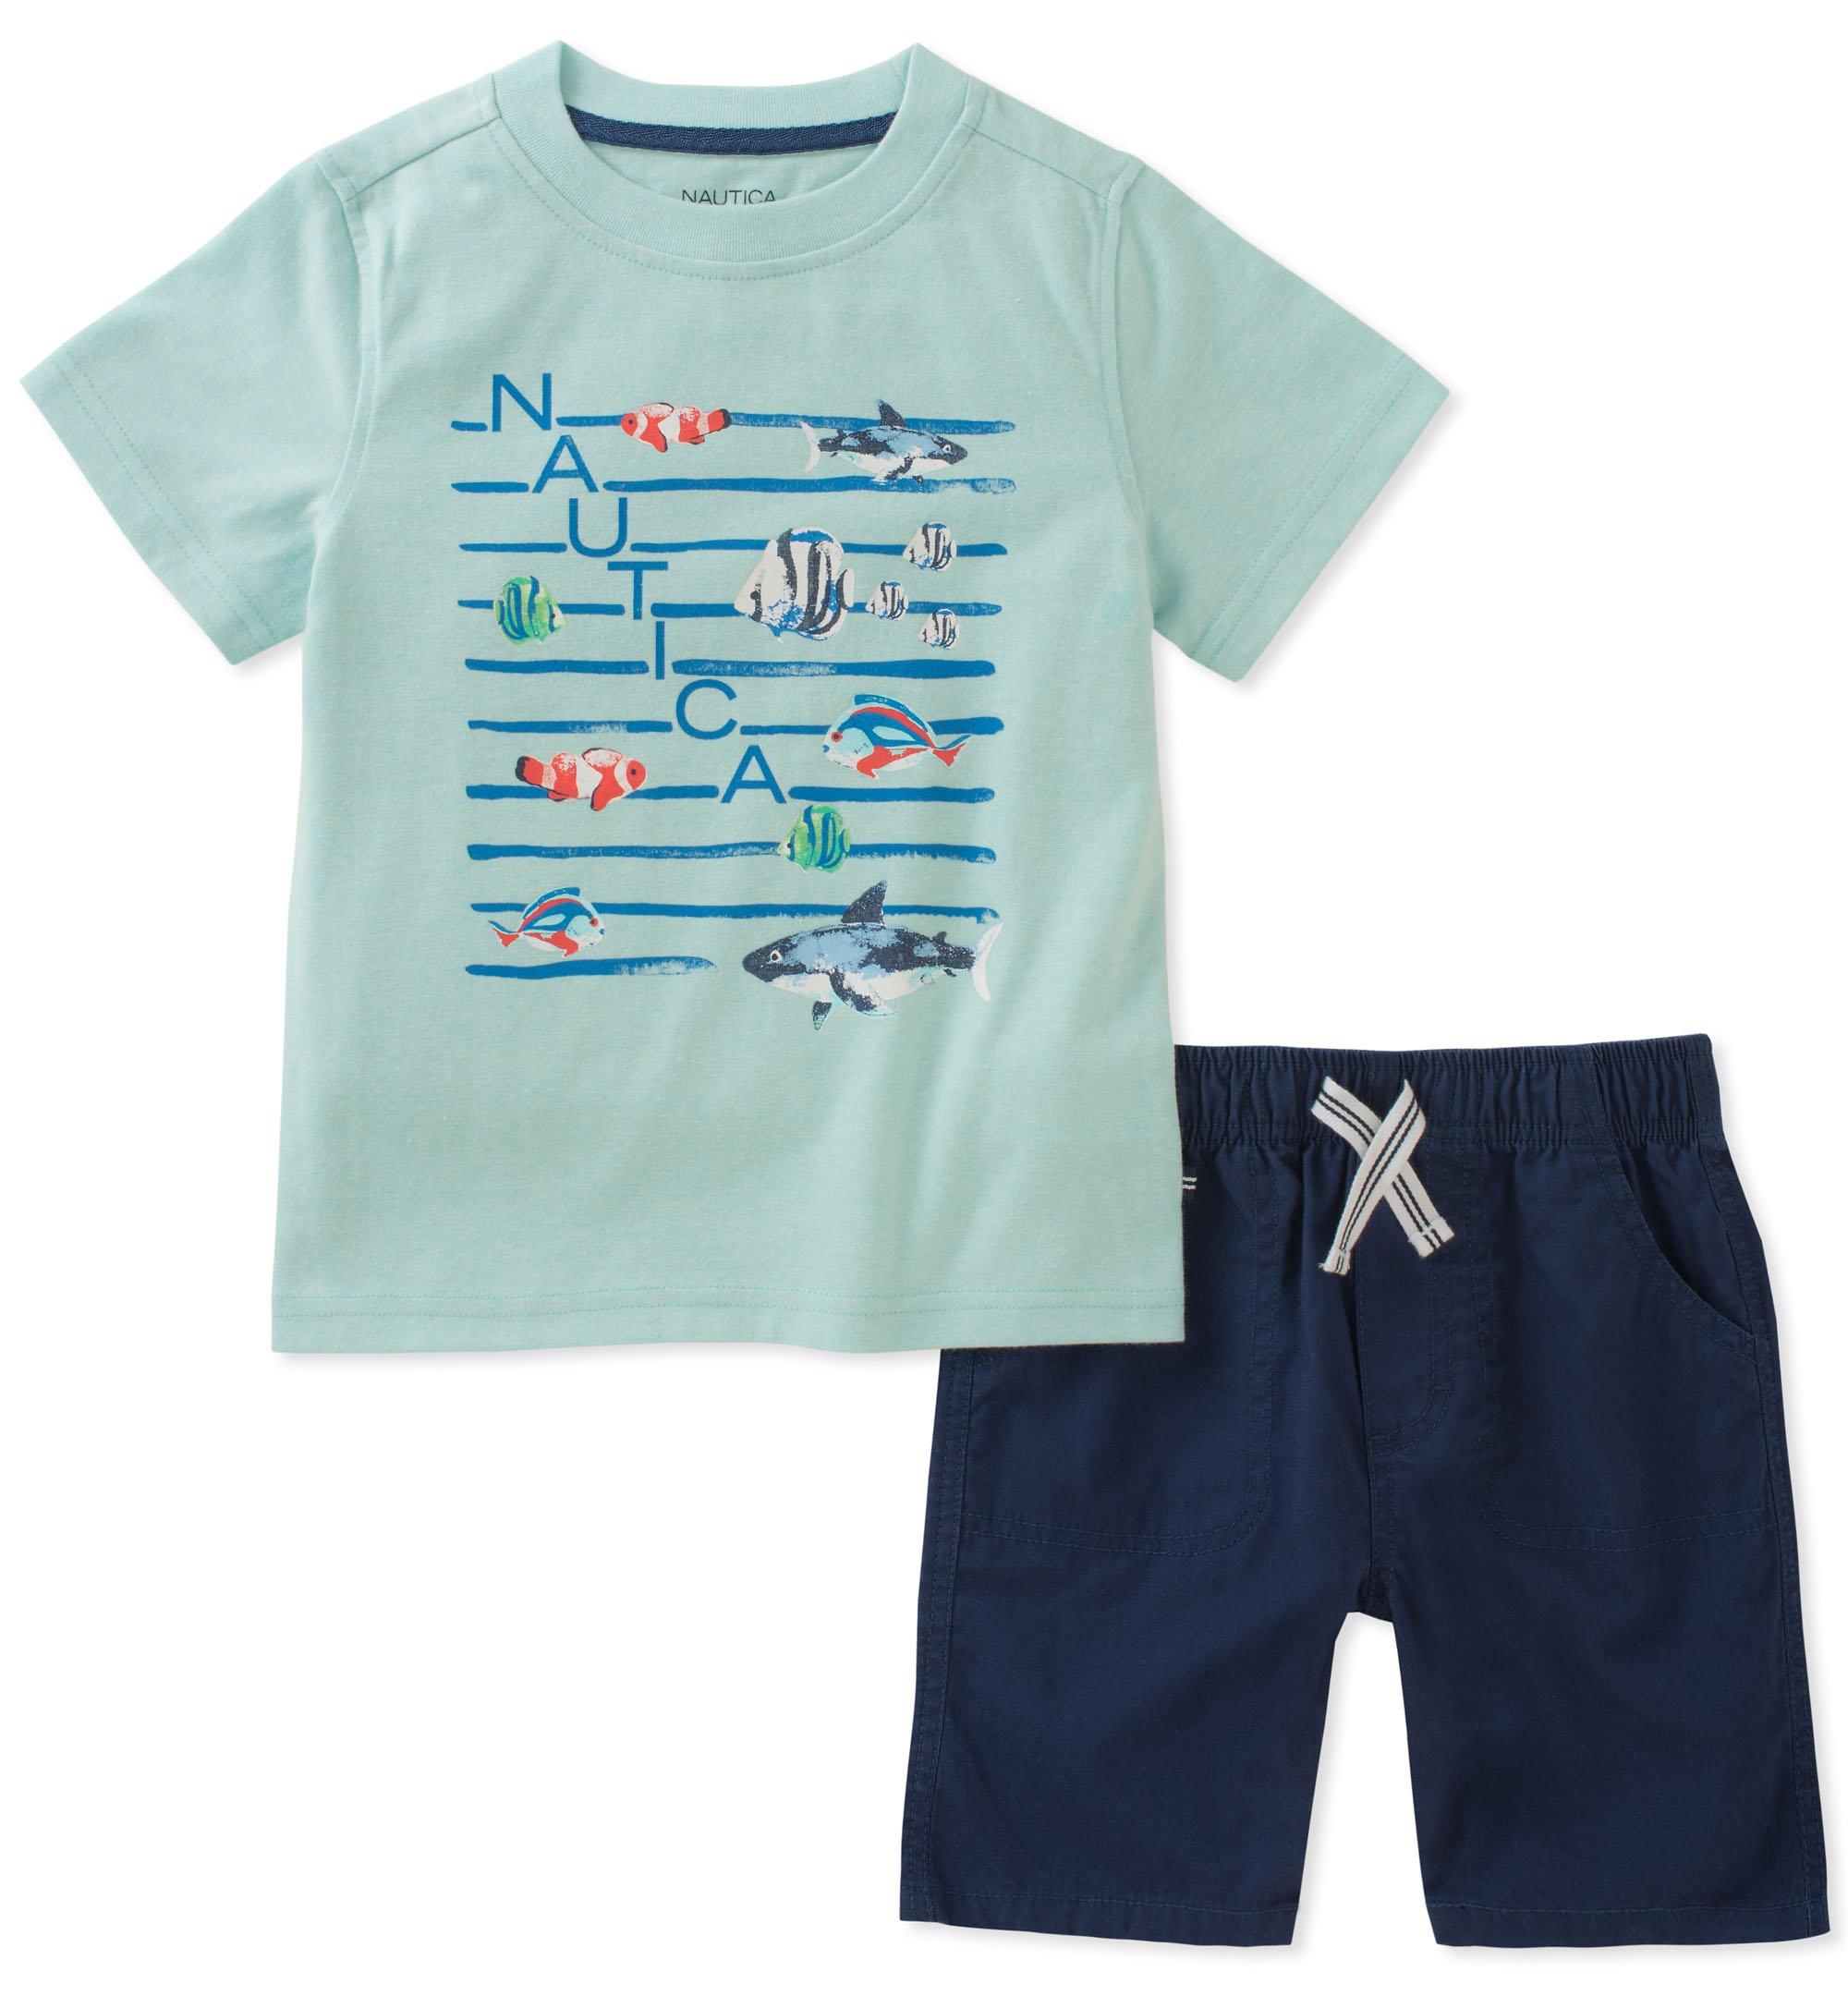 Nautica Boys' Tee with Shorts, Yellow, 7